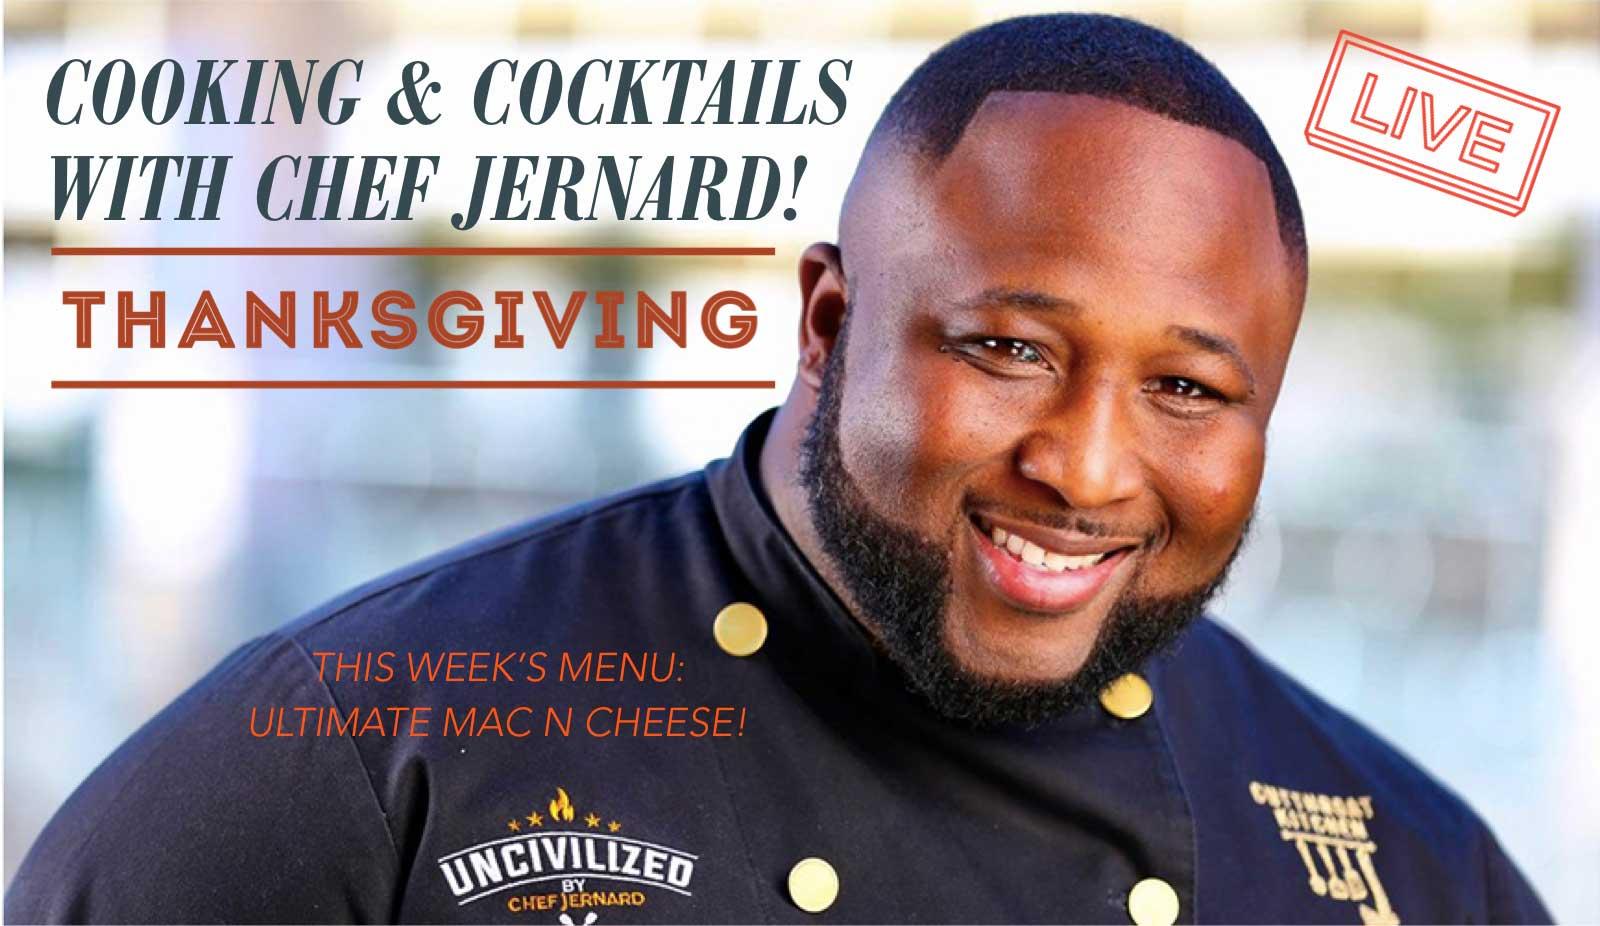 chef-jernard-thanksgiving-uncle-nearest